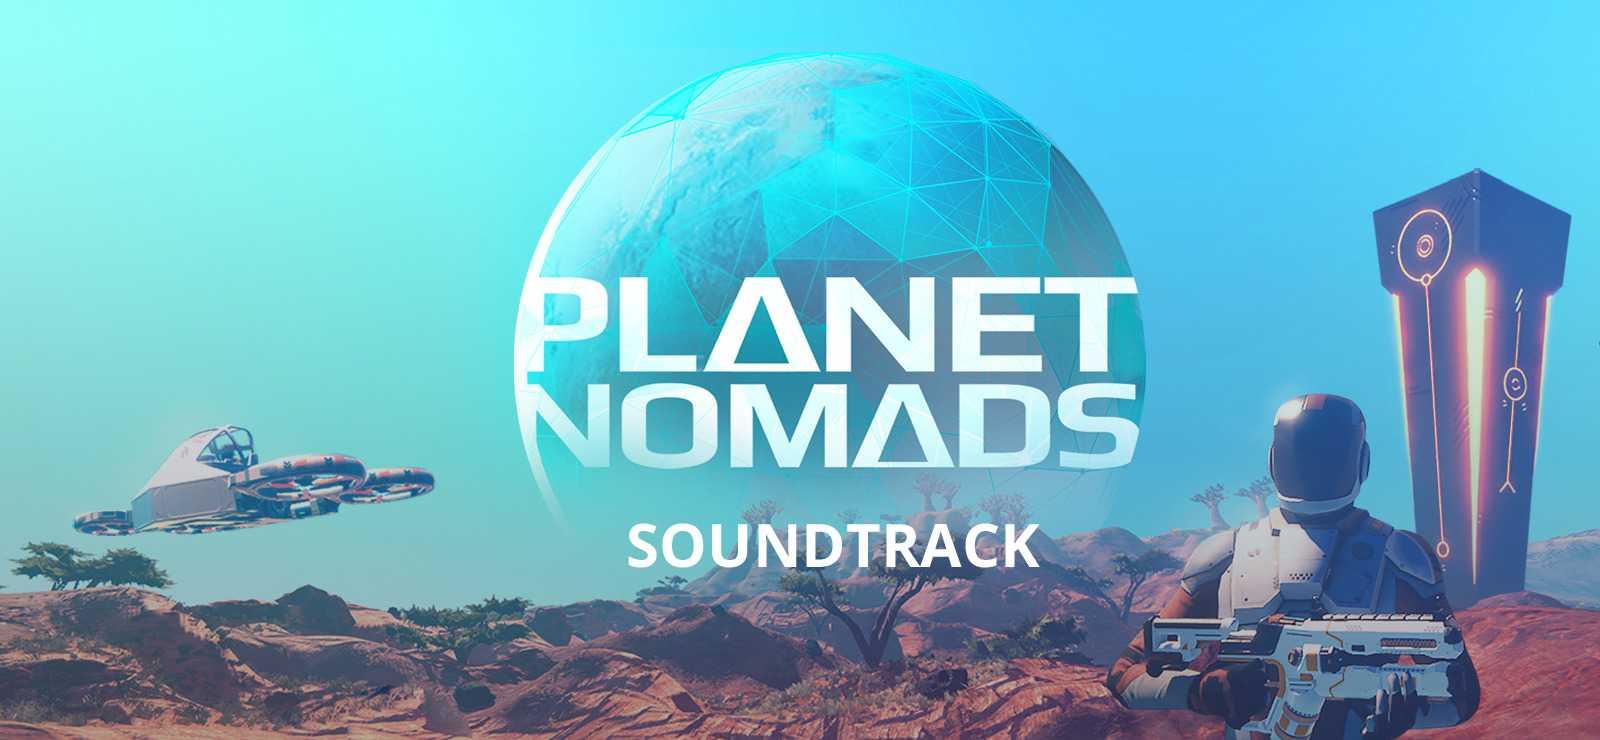 Planet Nomads Soundtrack